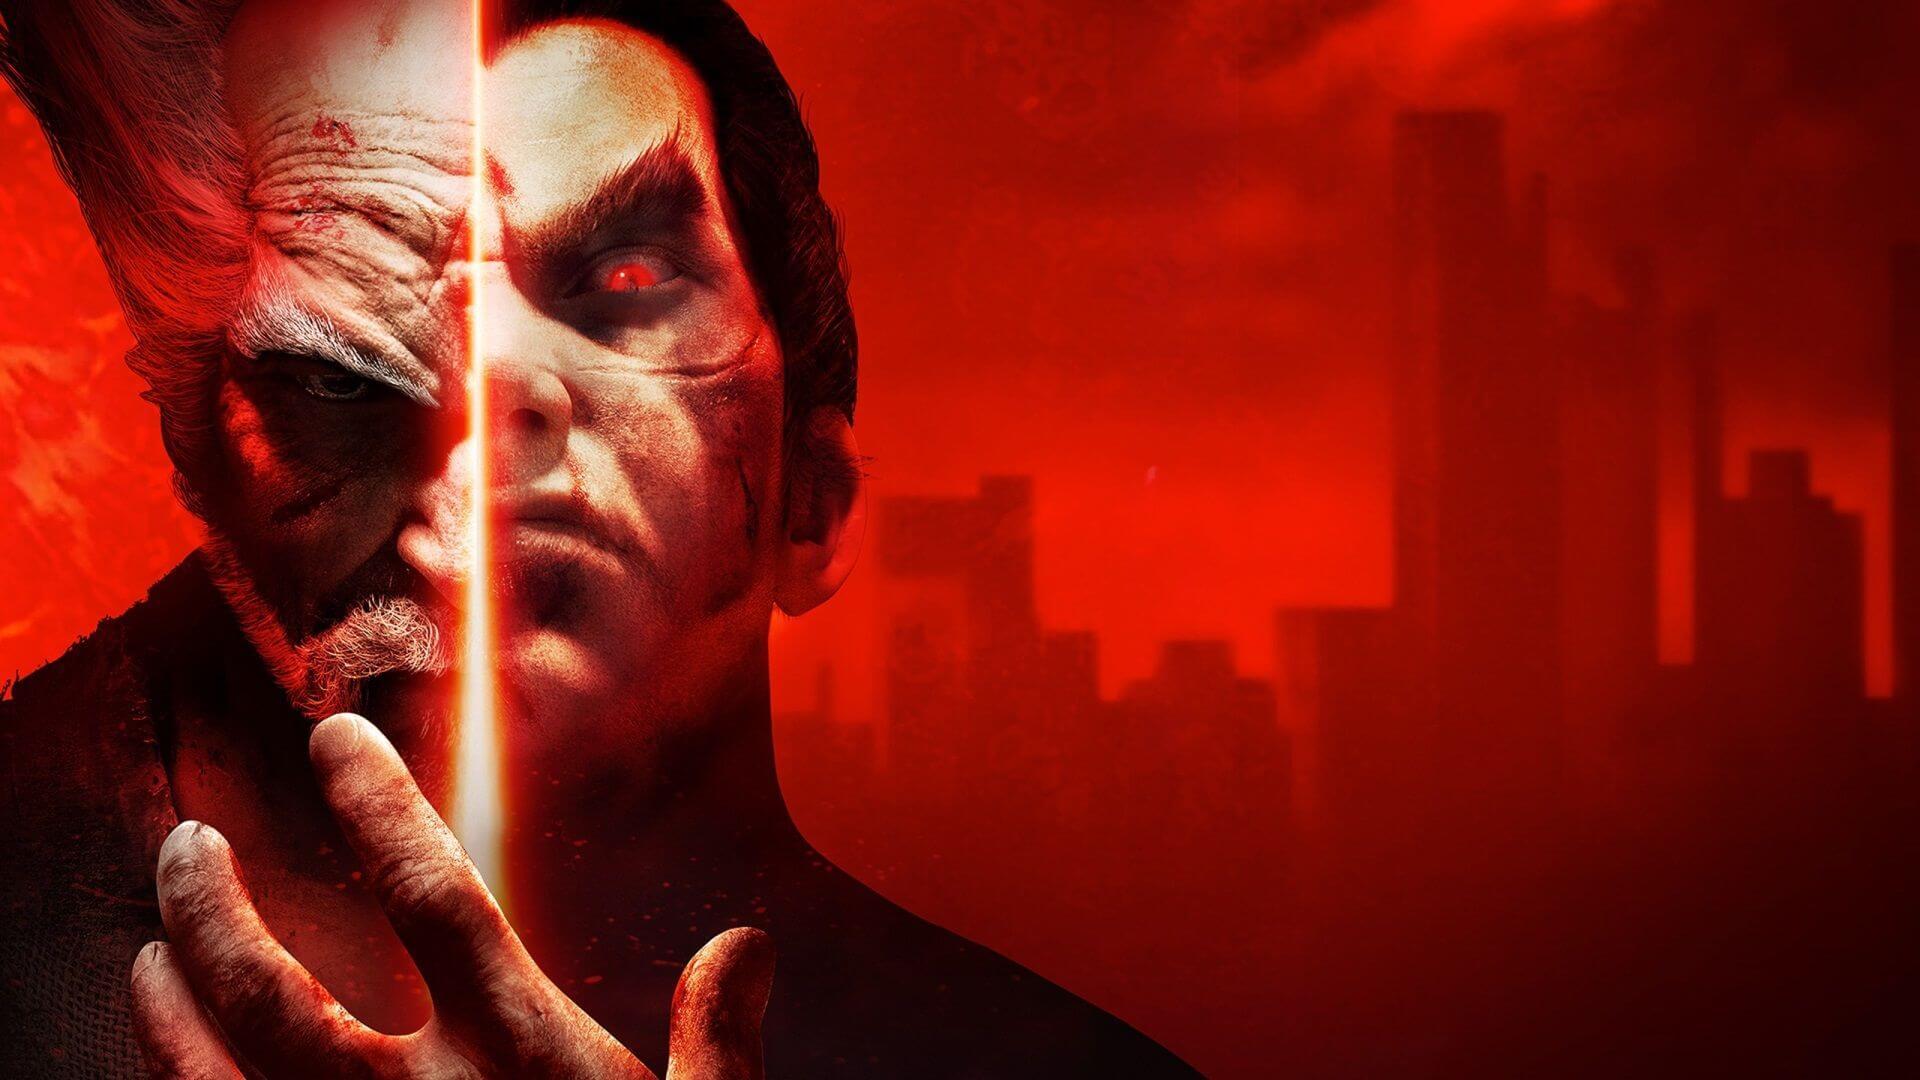 Tekken Series Music And Graphics Evolution